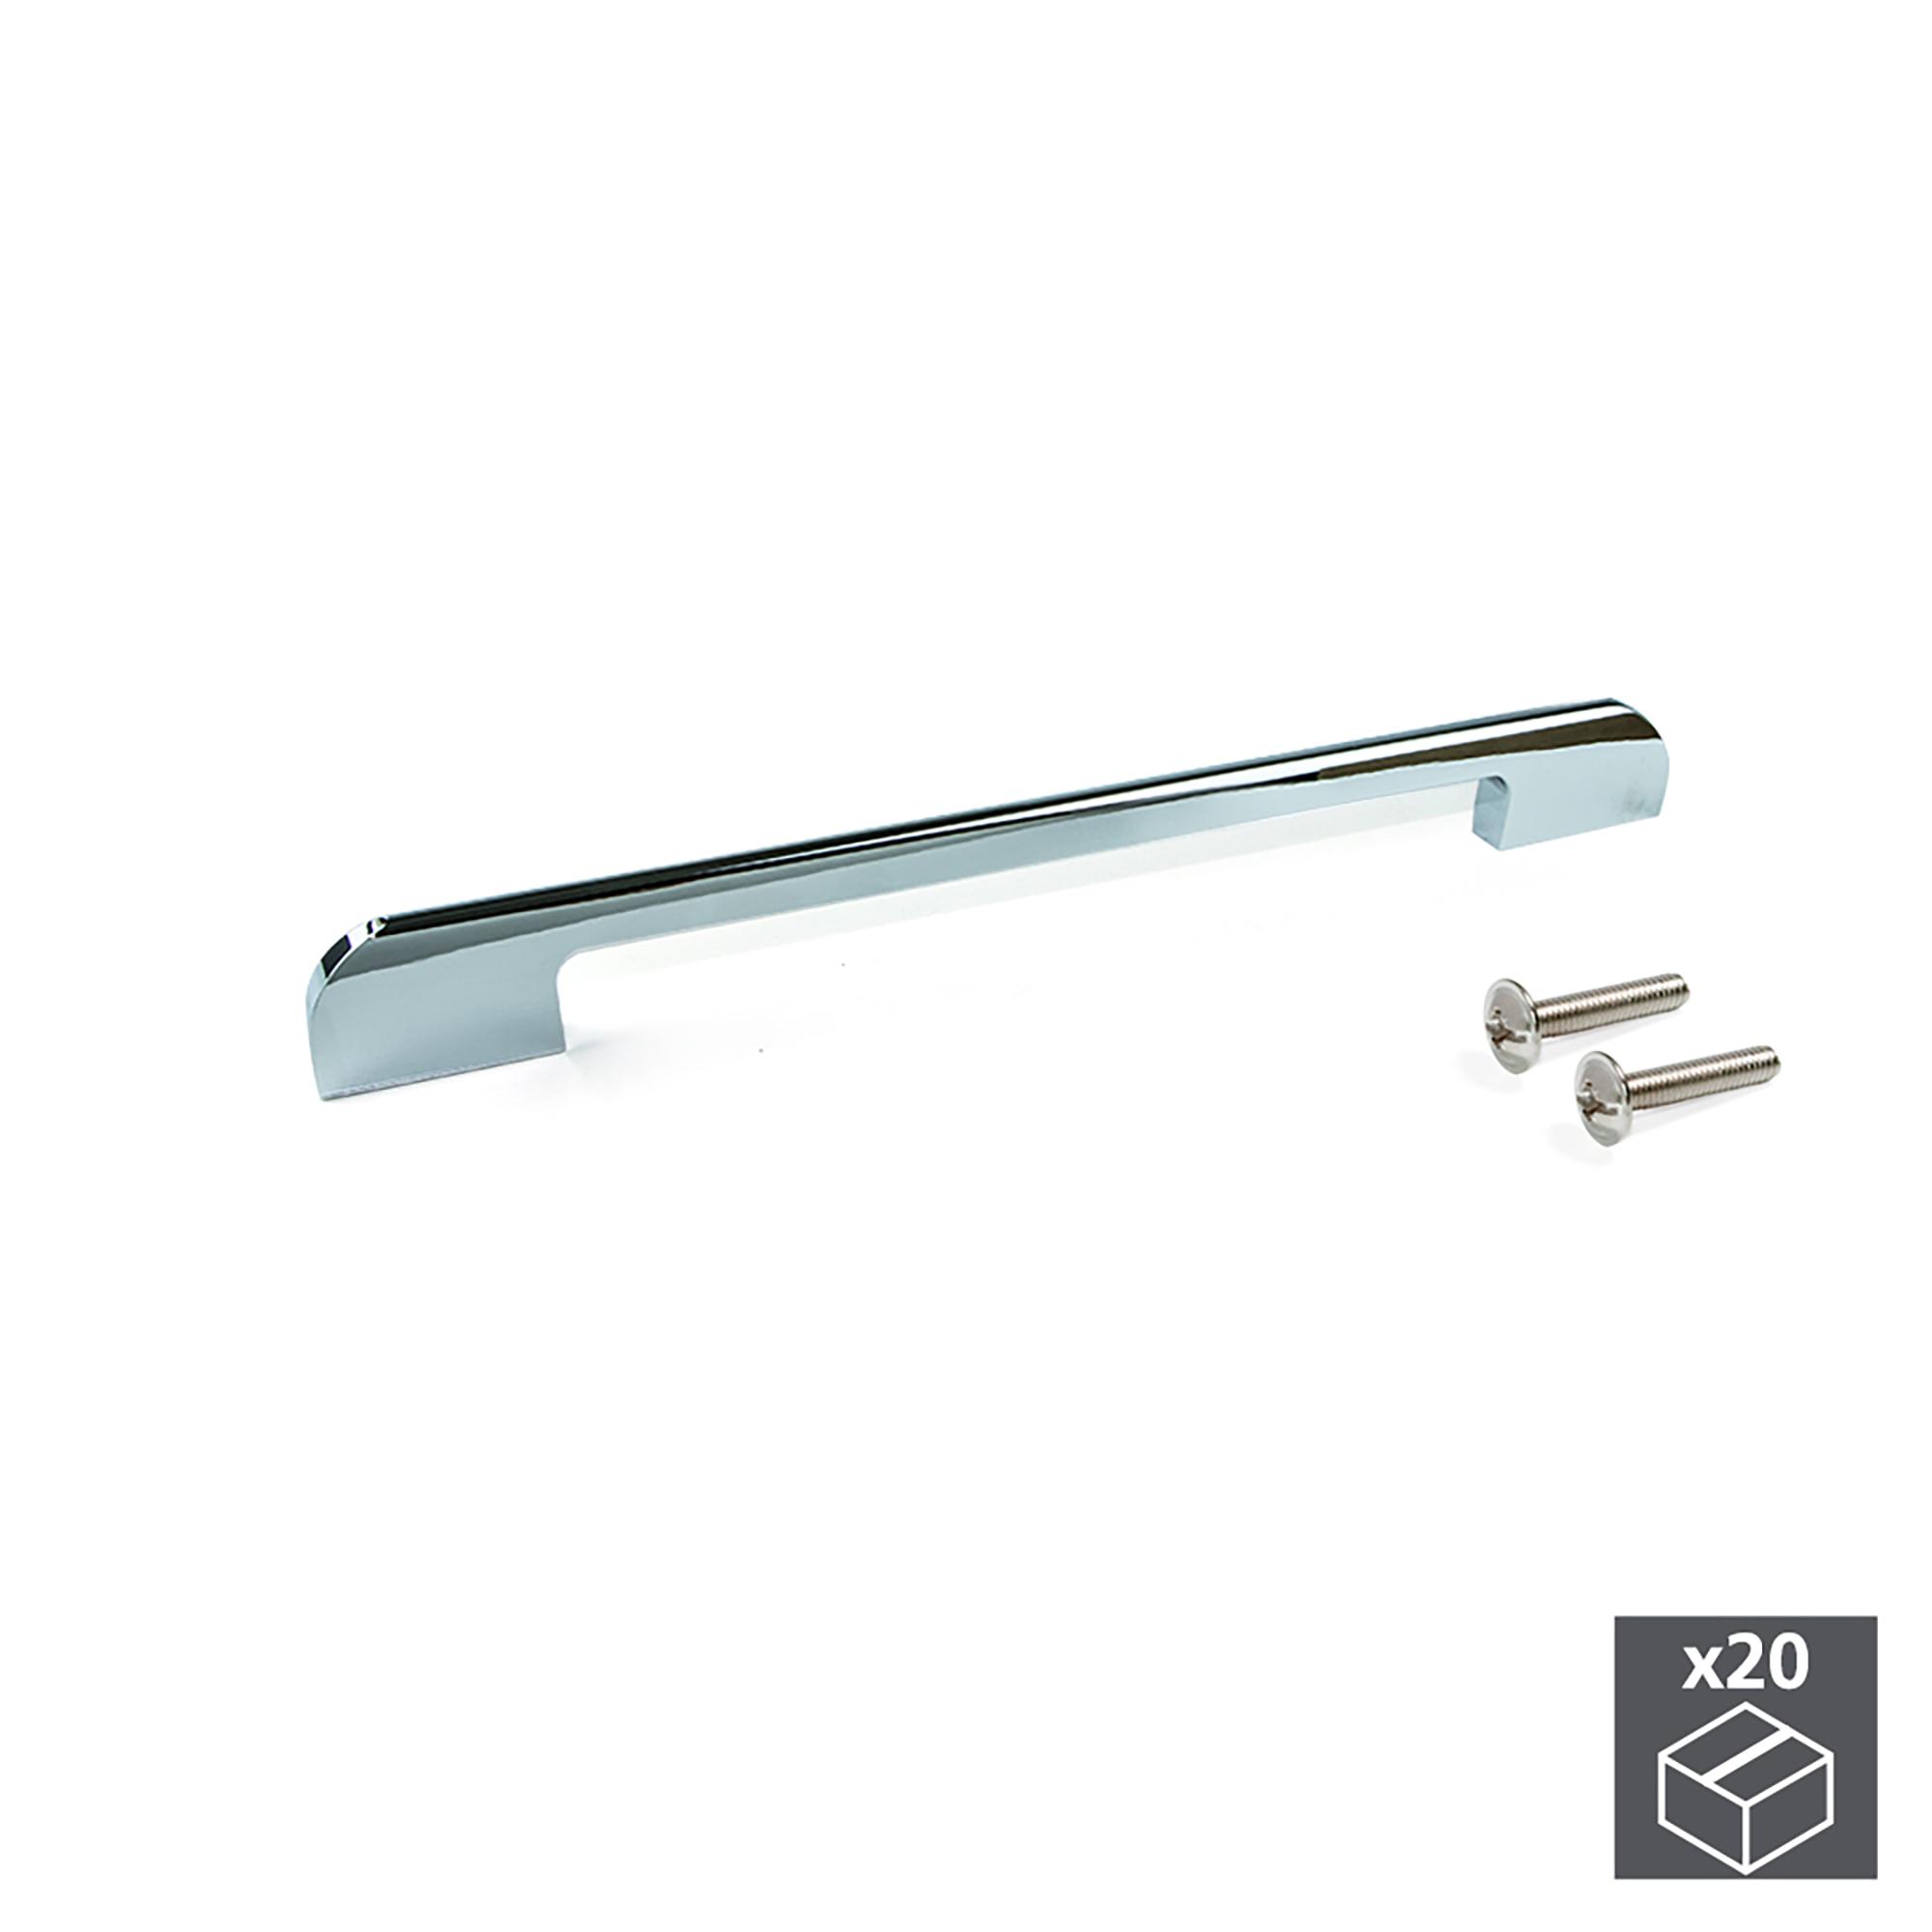 Emuca Maniglie per mobile, interasse 160 mm, Alluminio, Cromo, 20 u.